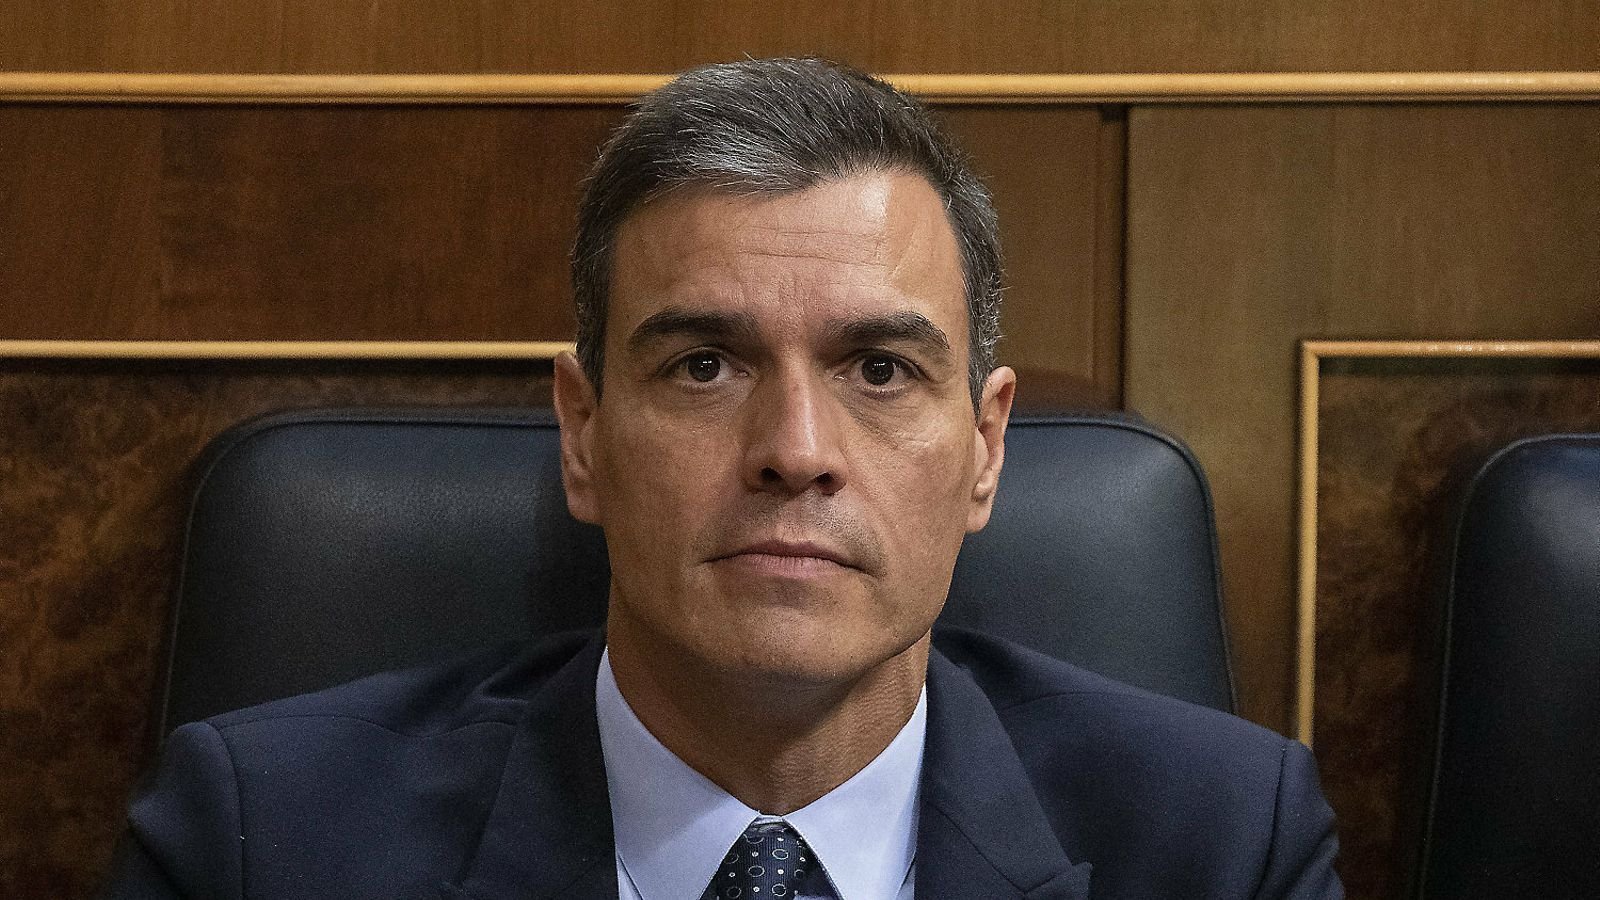 Dins el cap de Pedro Sánchez